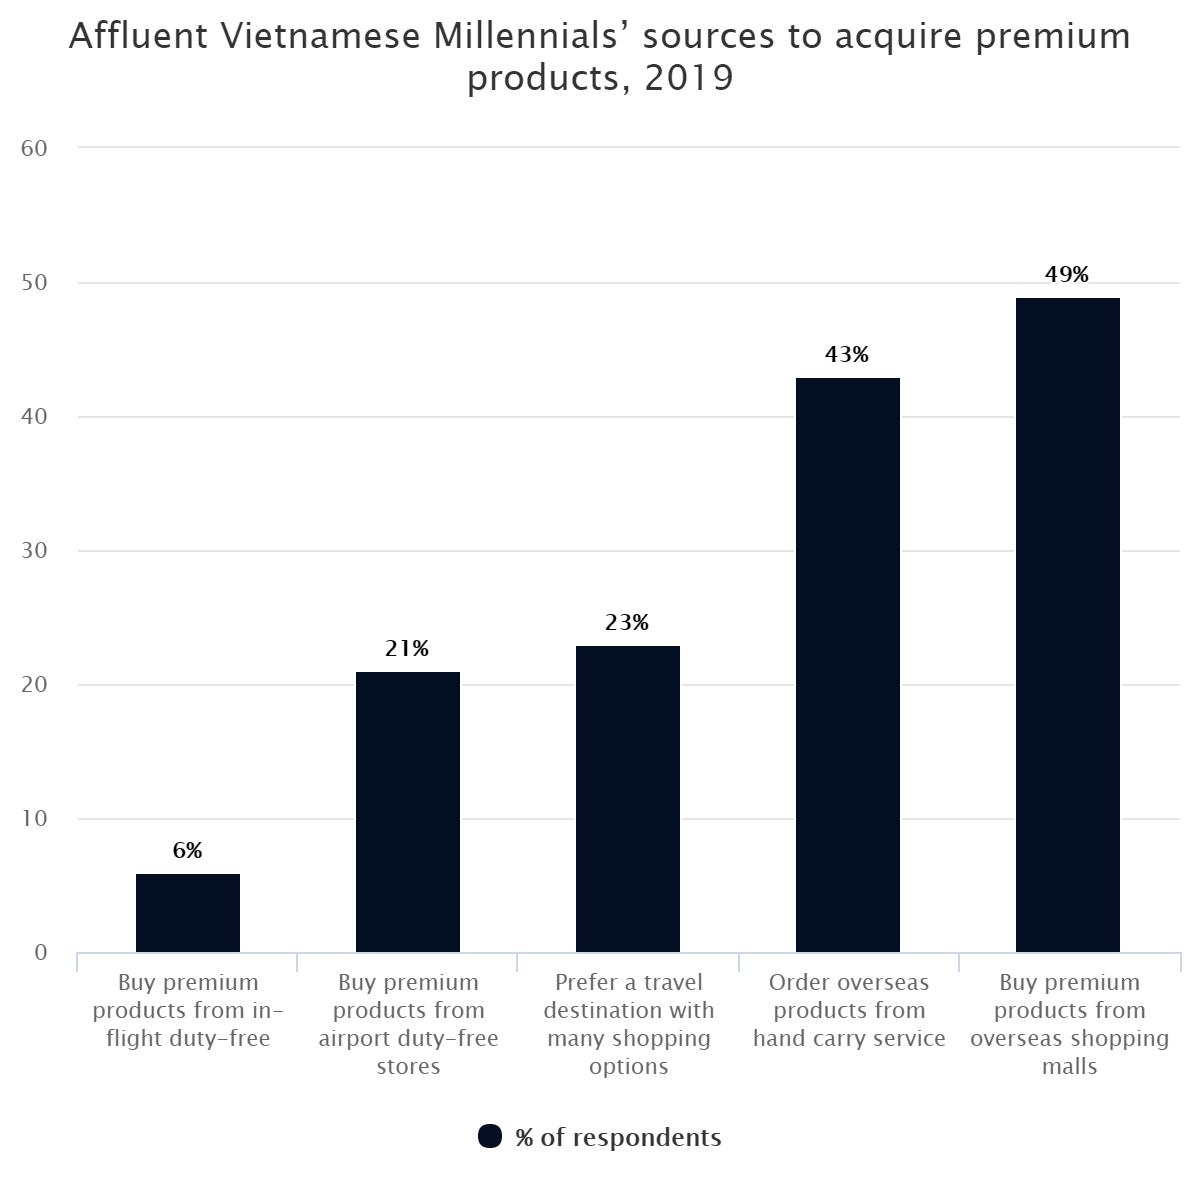 Affluent Vietnamese Millennials' sources to acquire premium products, 2019